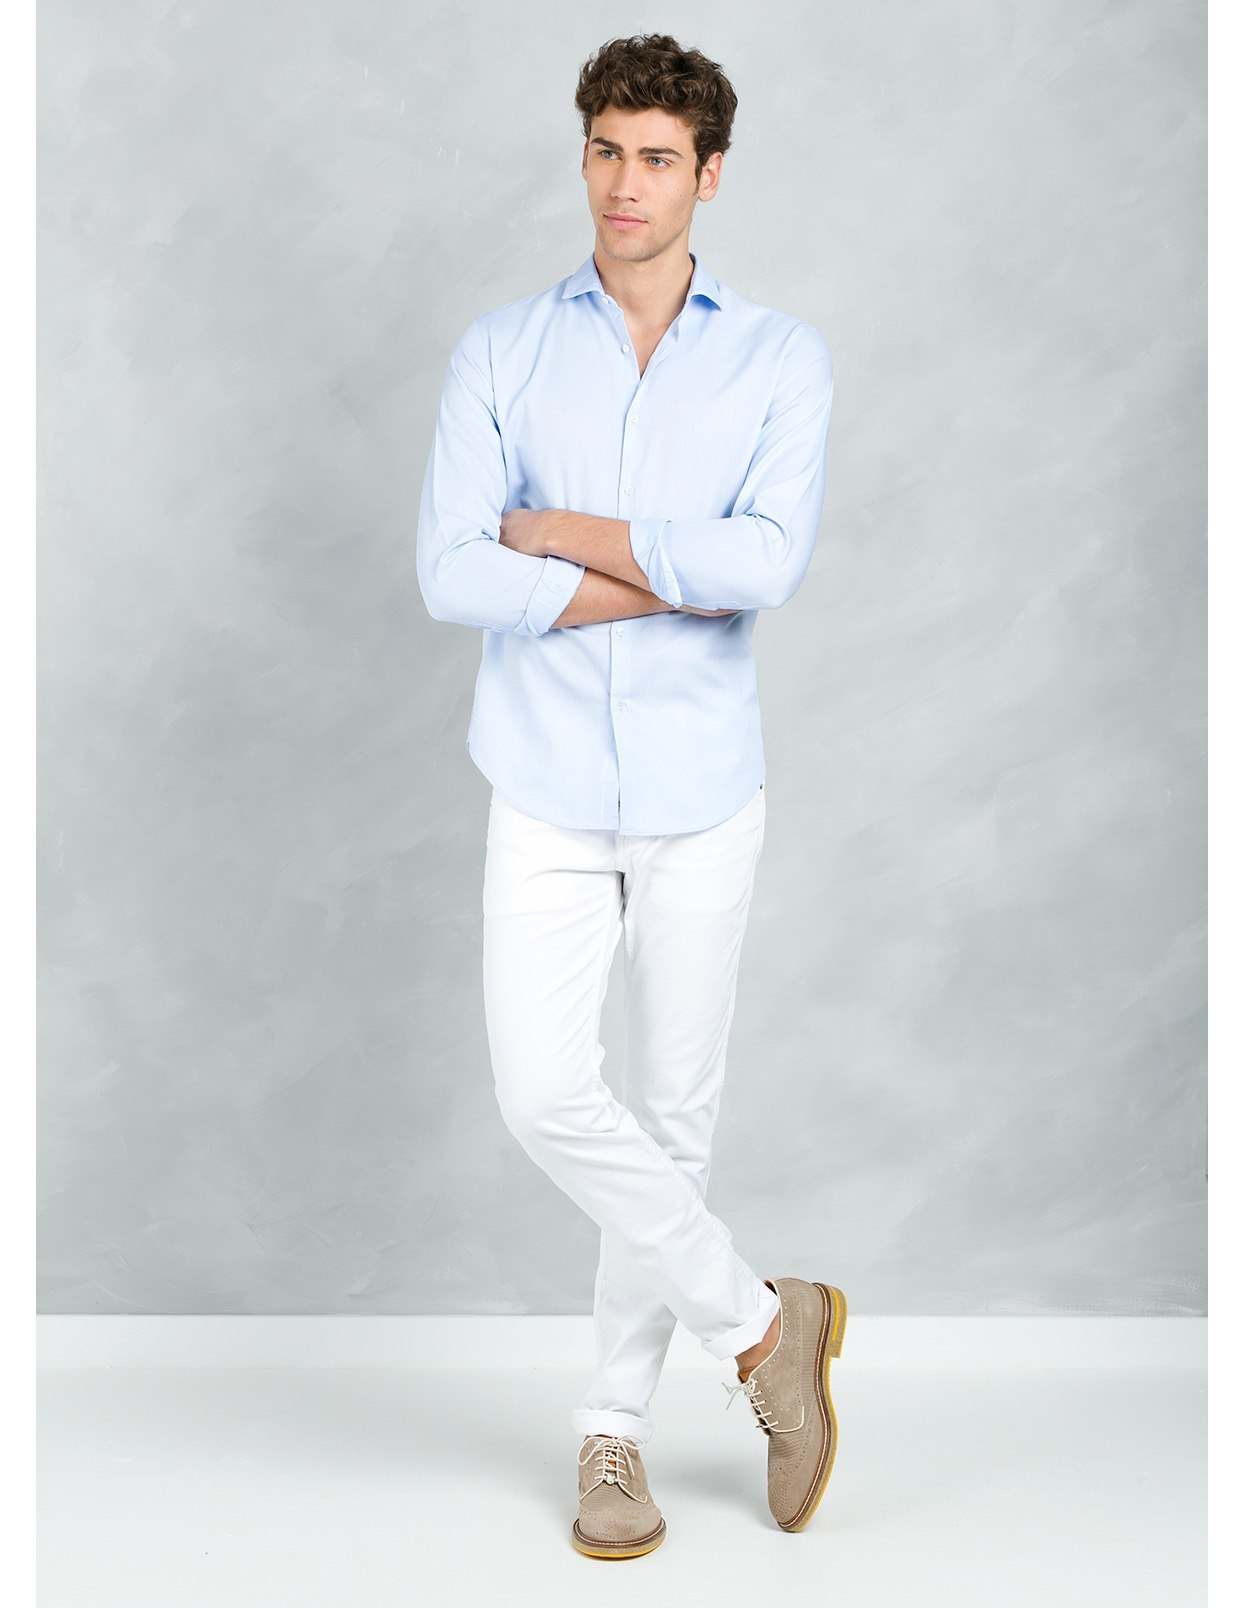 Camisa sport SLIM FIT modelo MATTIA RL, color azul, 100% Algodón. - Ítem1